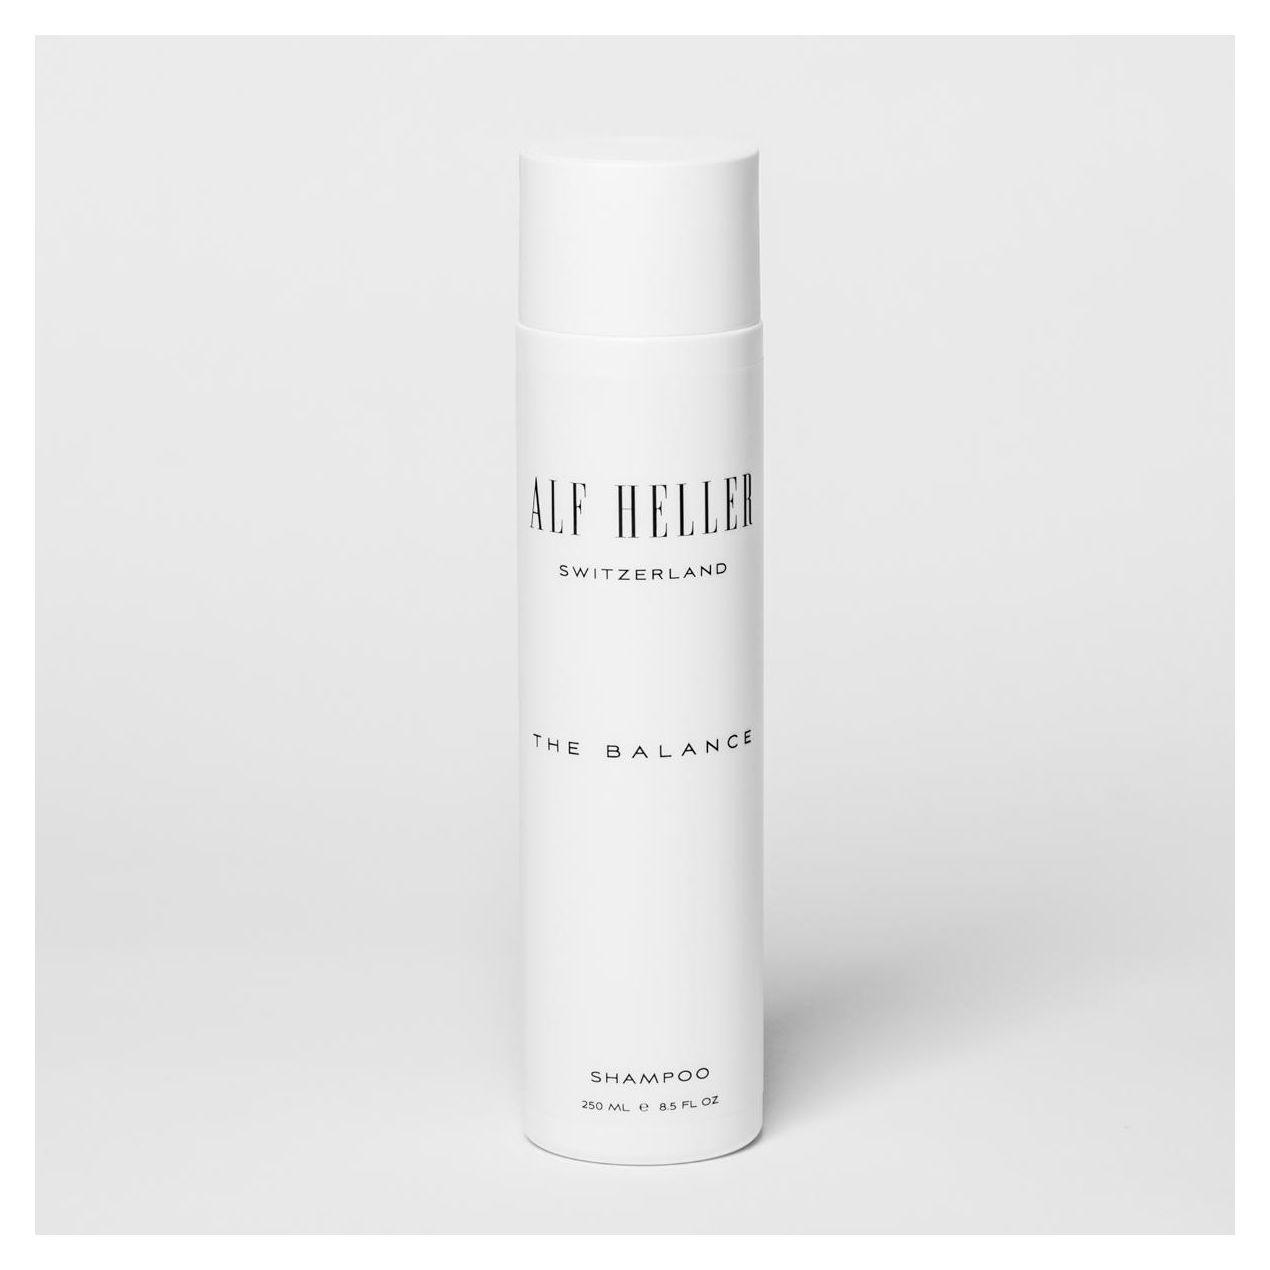 THE BALANCE shampoo